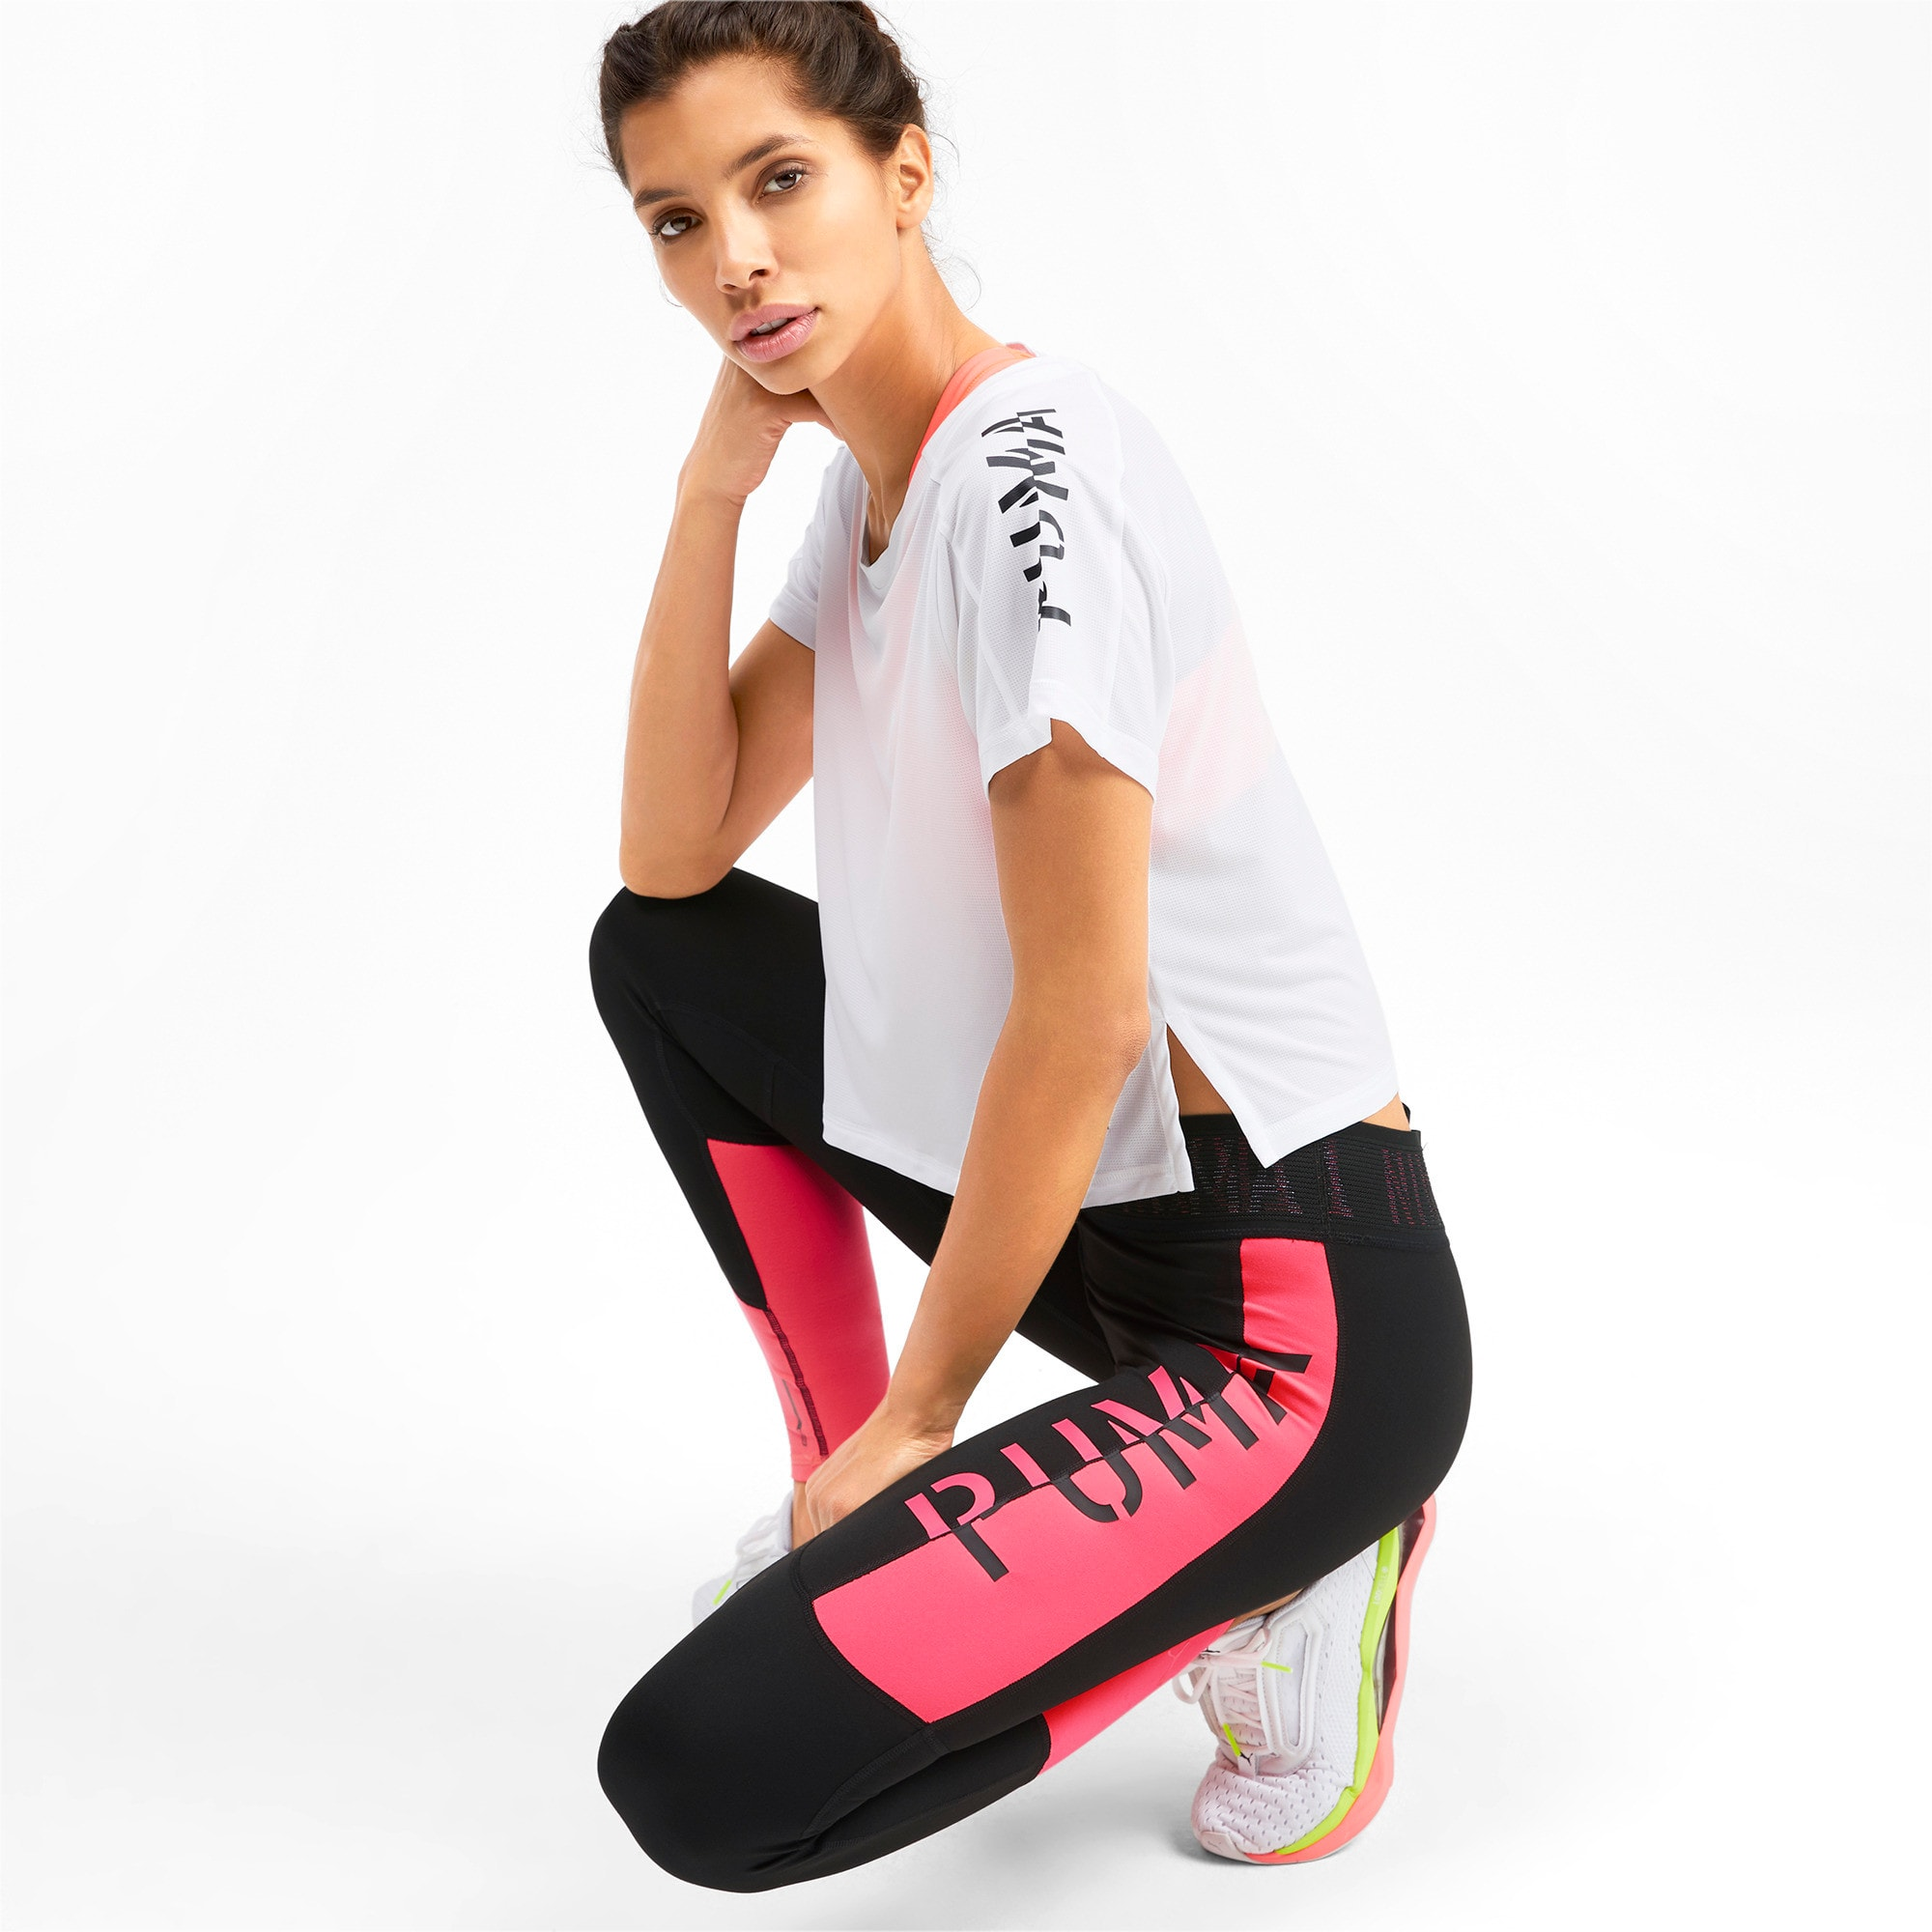 Thumbnail 3 of Logo Women's 7/8 Leggings, Puma Black-Pink Alert, medium